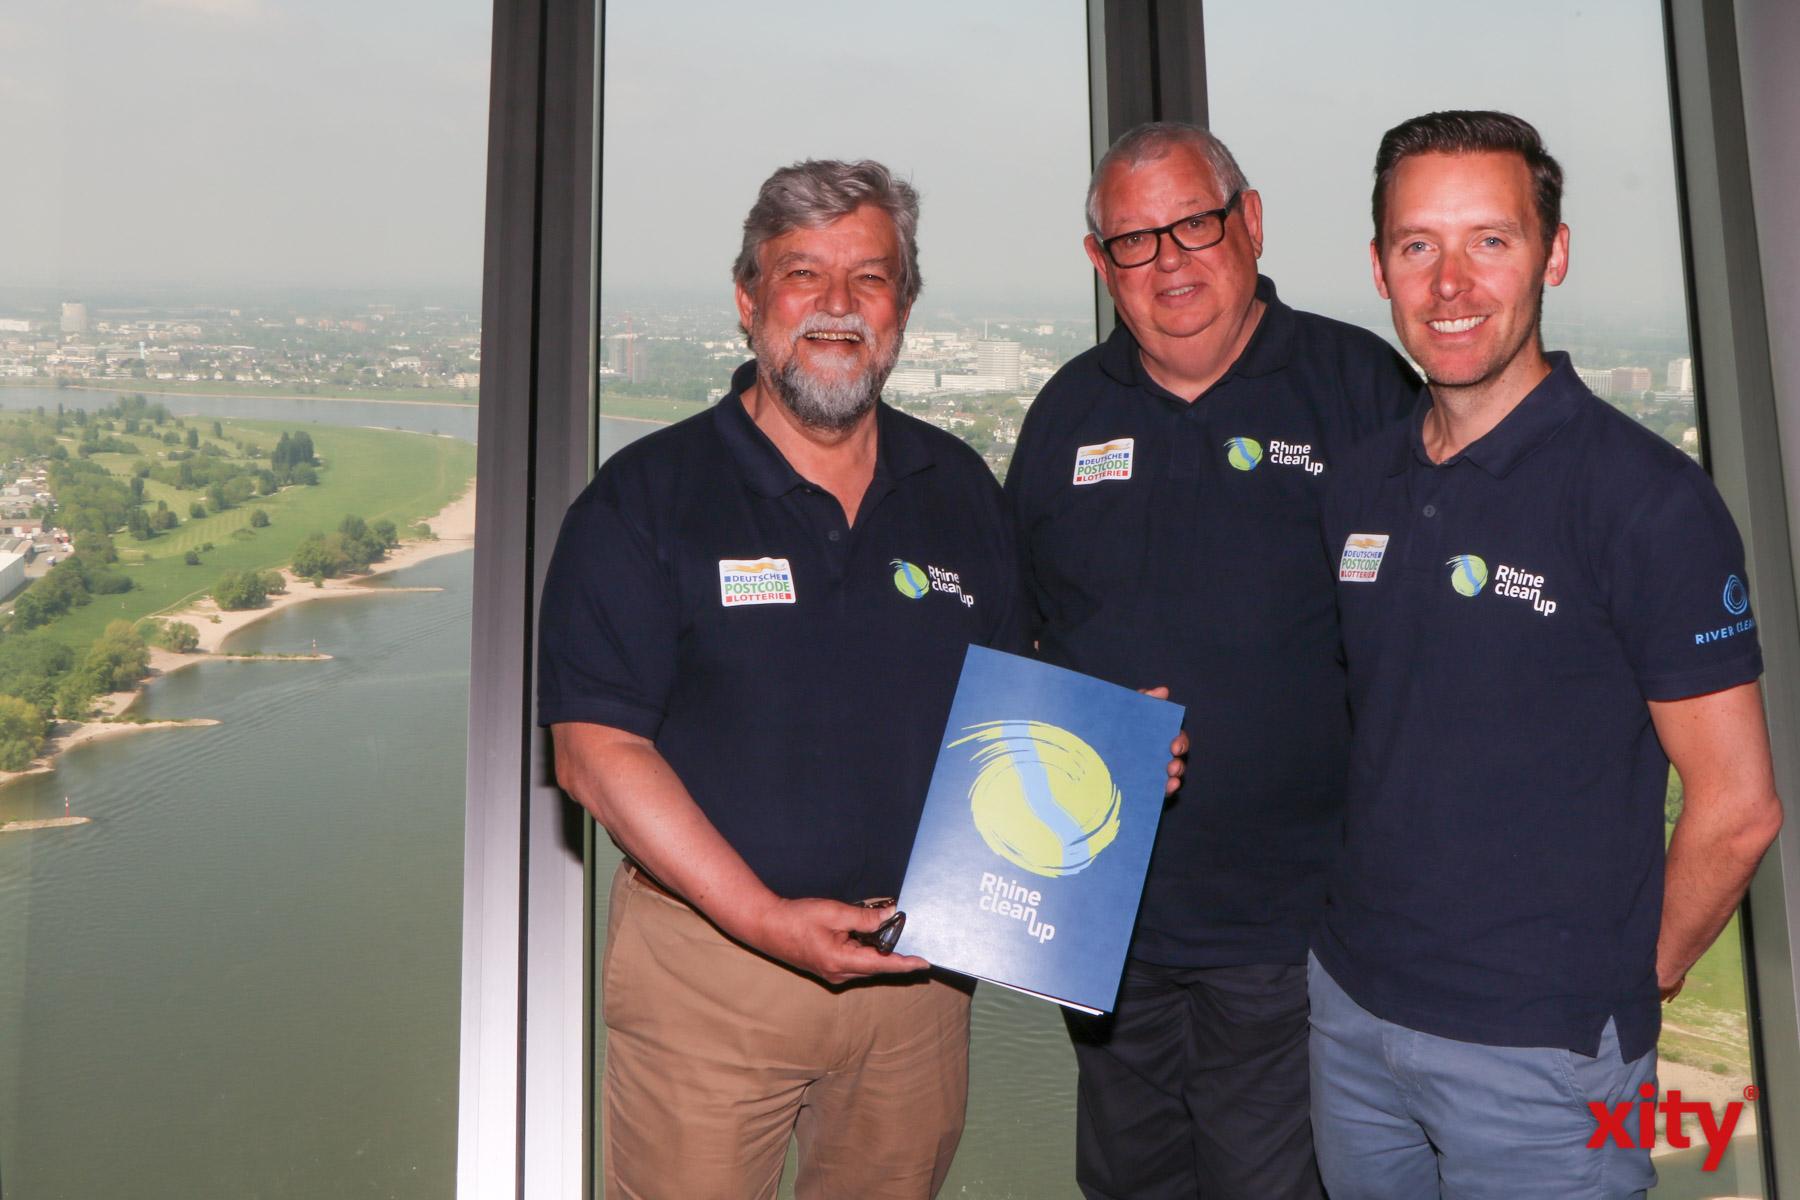 Das Team RhineCleanUp: Joachim Umbach, Ingo Lentz und Thomas de Groote (Foto: xity)